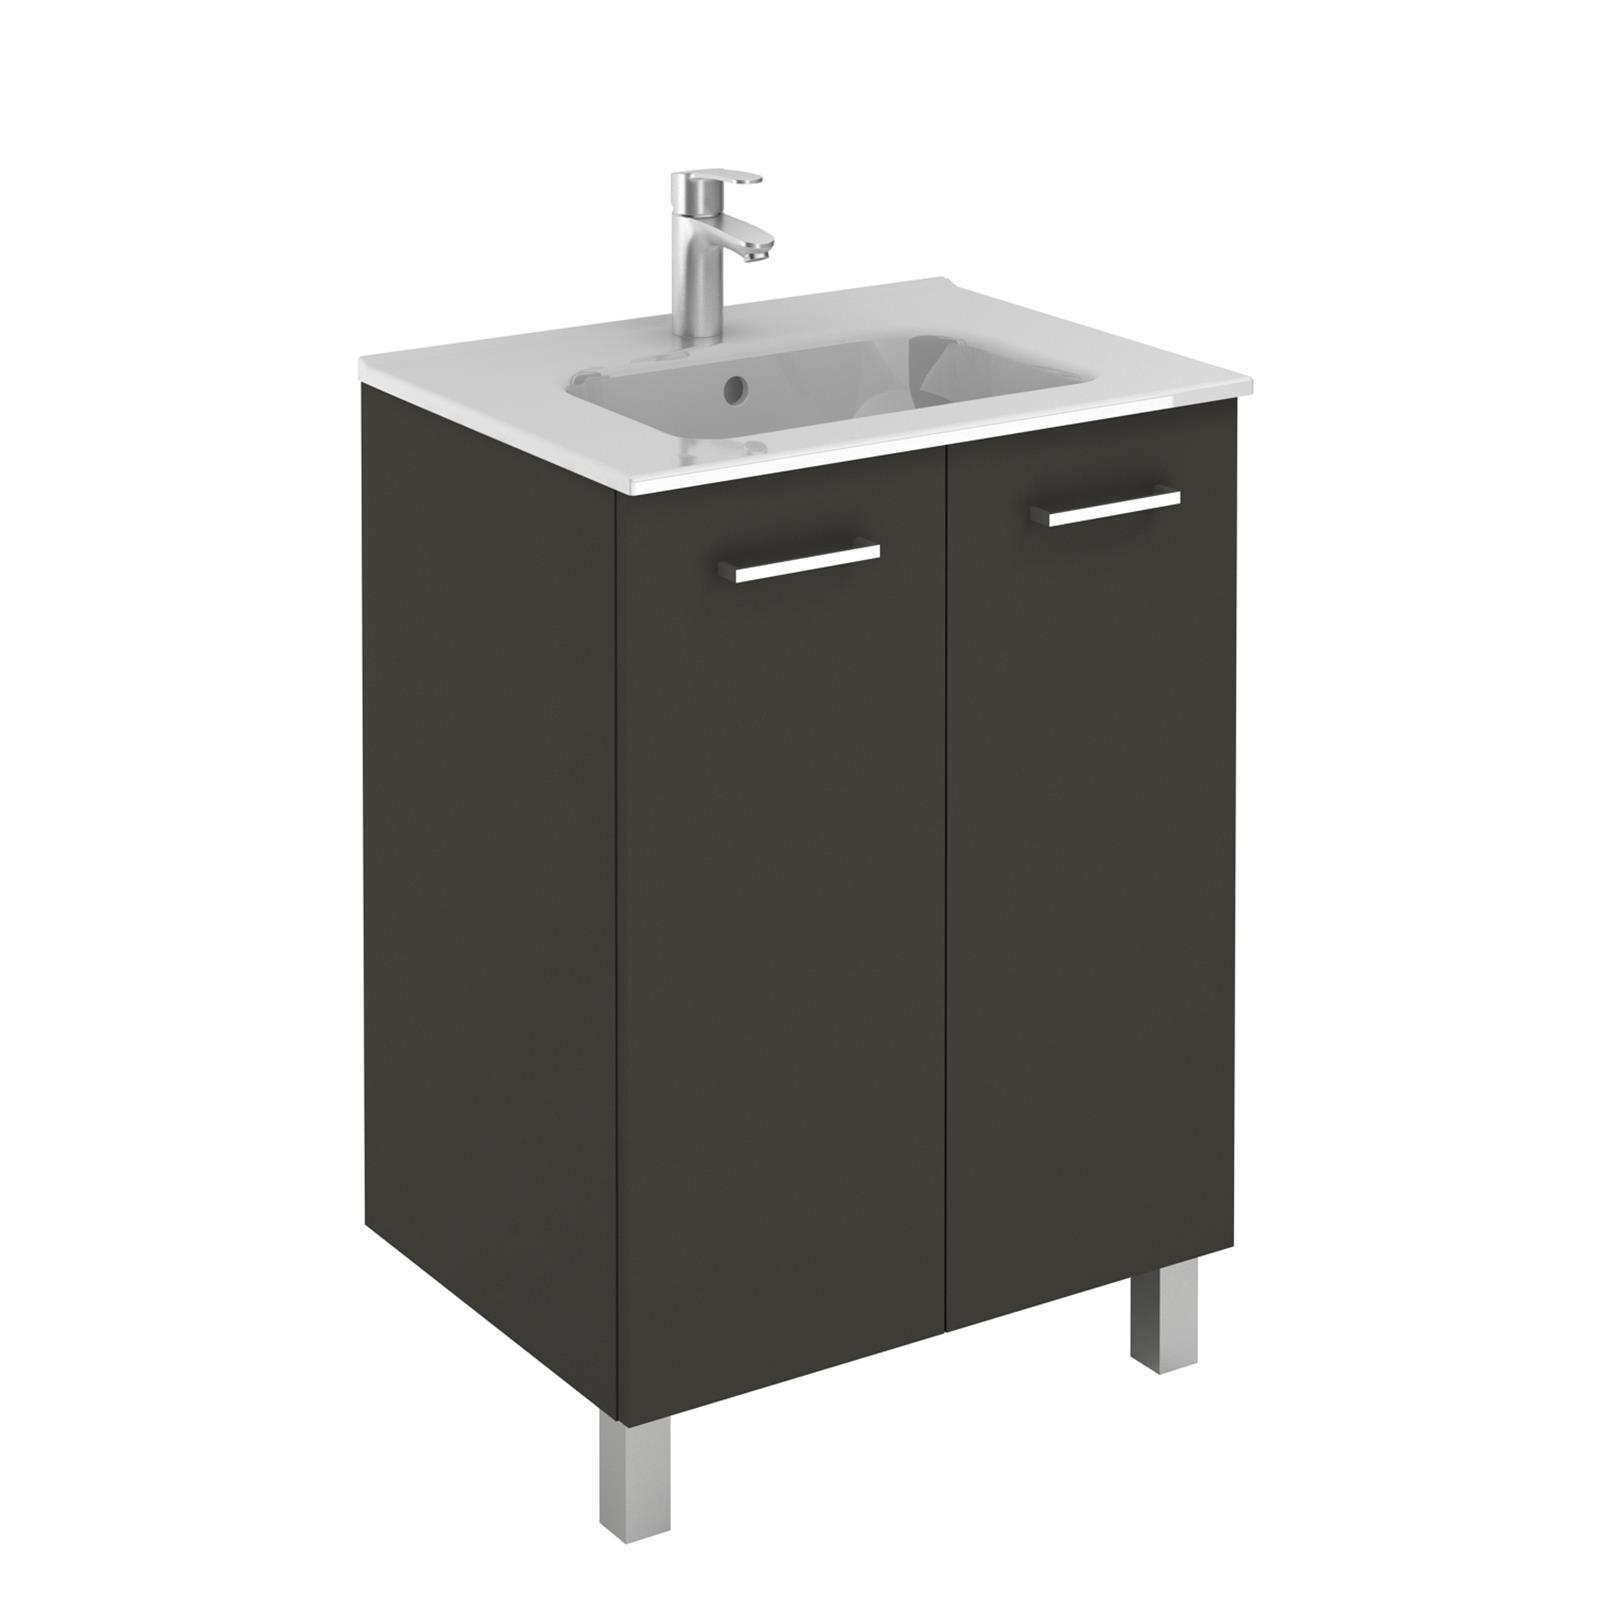 sanitaire: meubles salle de bains - Meuble Salle De Bain Profondeur 60 Cm